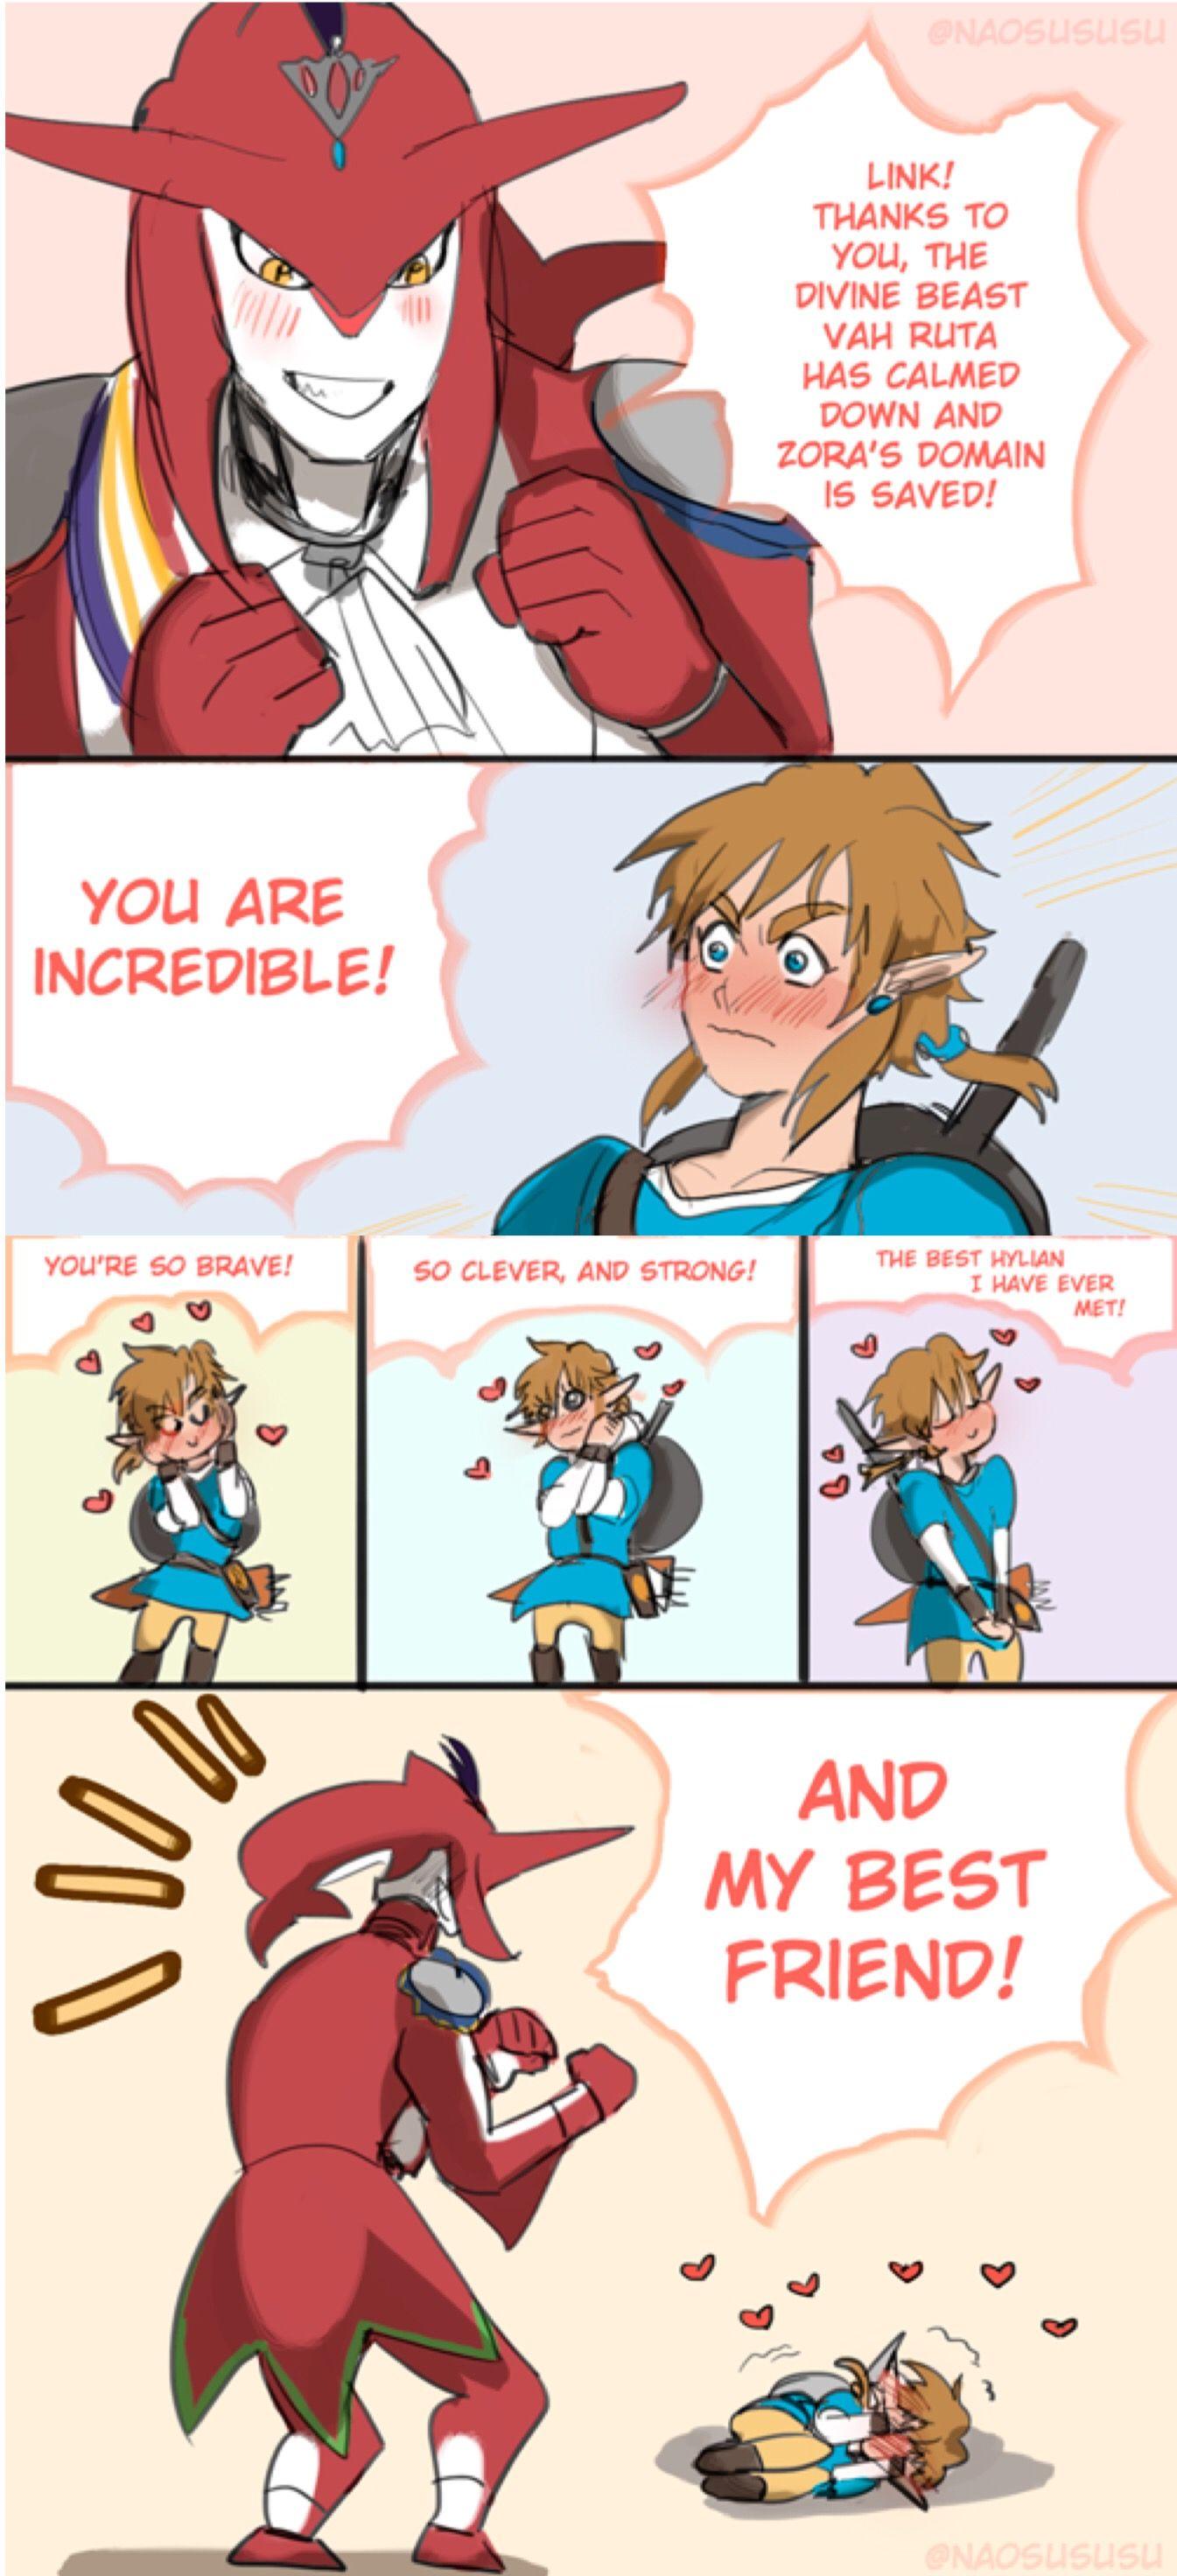 Zelda of link legend gay fanart